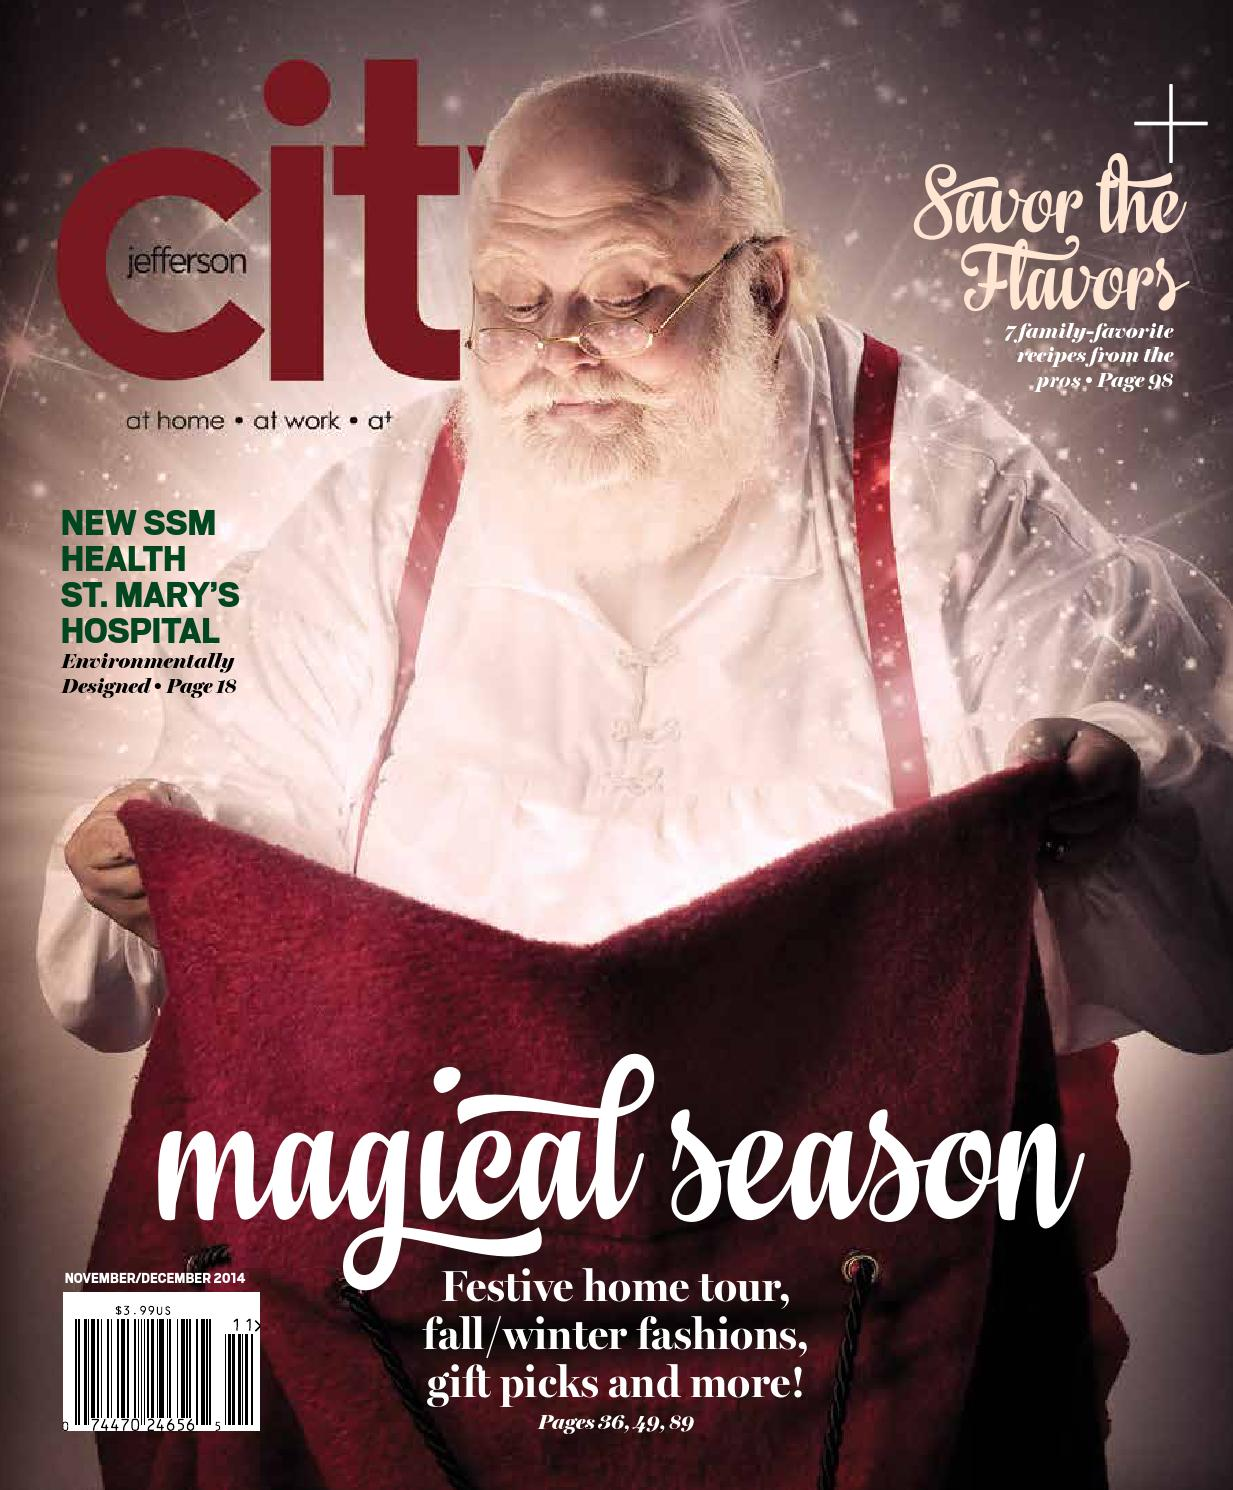 Jefferson City Magazine - November/December 2014 by Business Times Company  - issuu